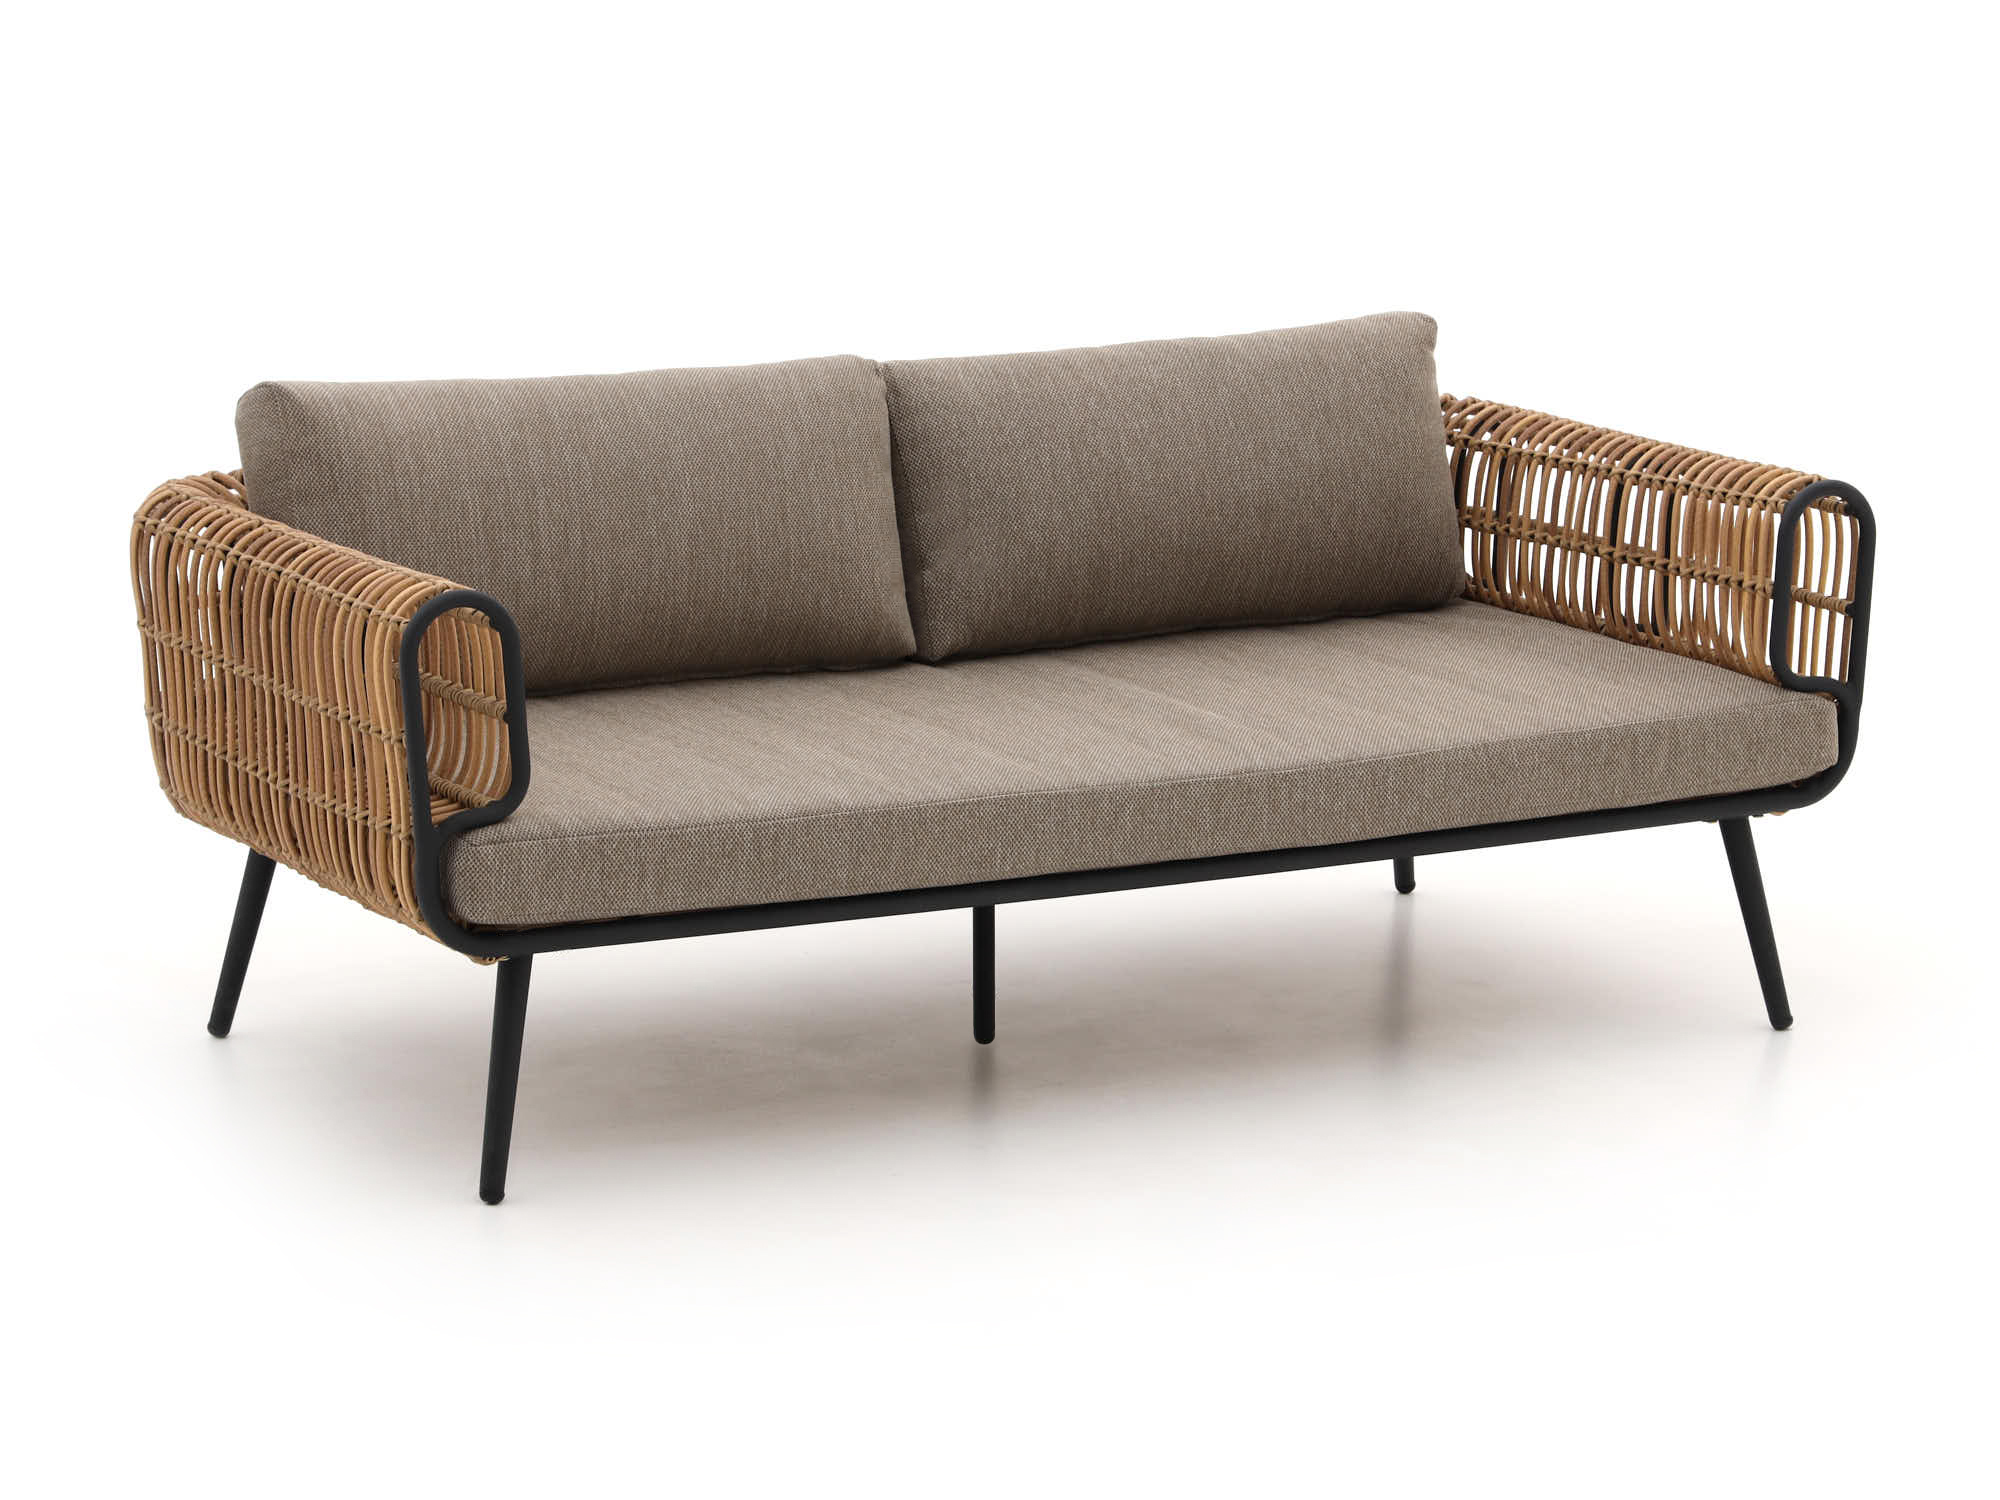 Intenso Averti lounge tuinbank - Laagste prijsgarantie!